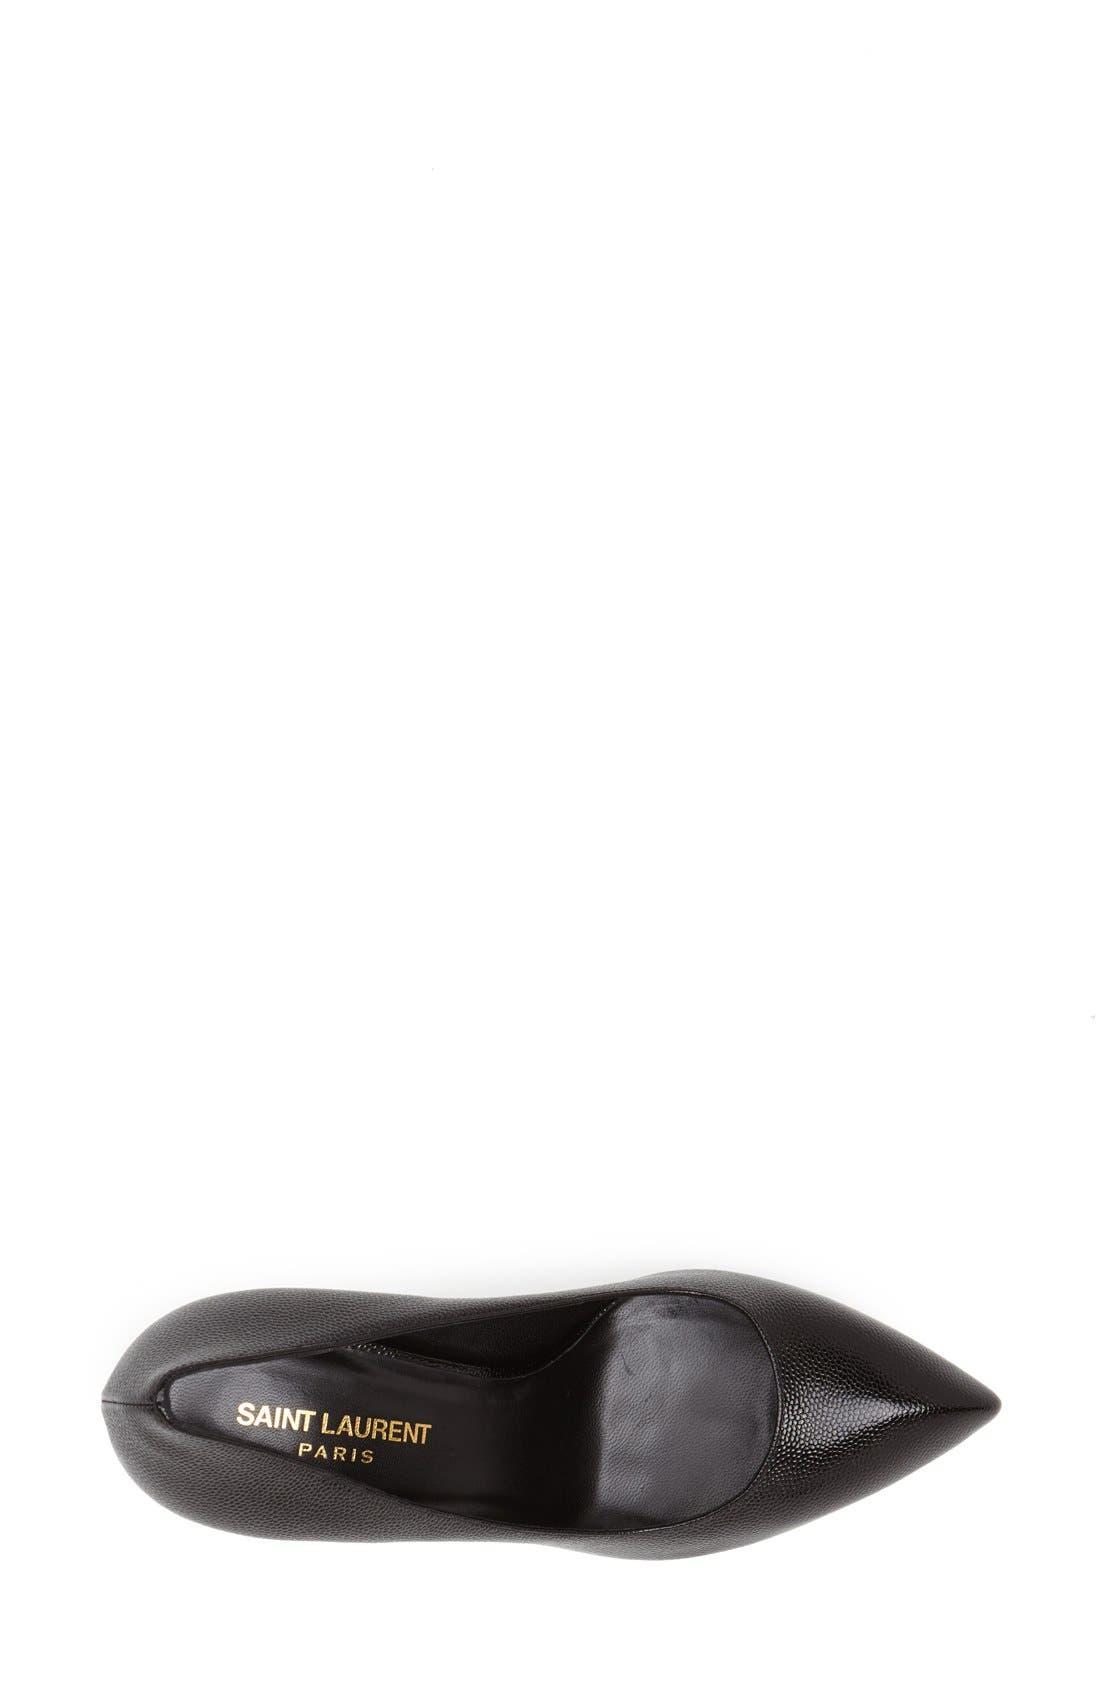 'Janis' Pointy Toe Platform Pump,                             Alternate thumbnail 3, color,                             Black